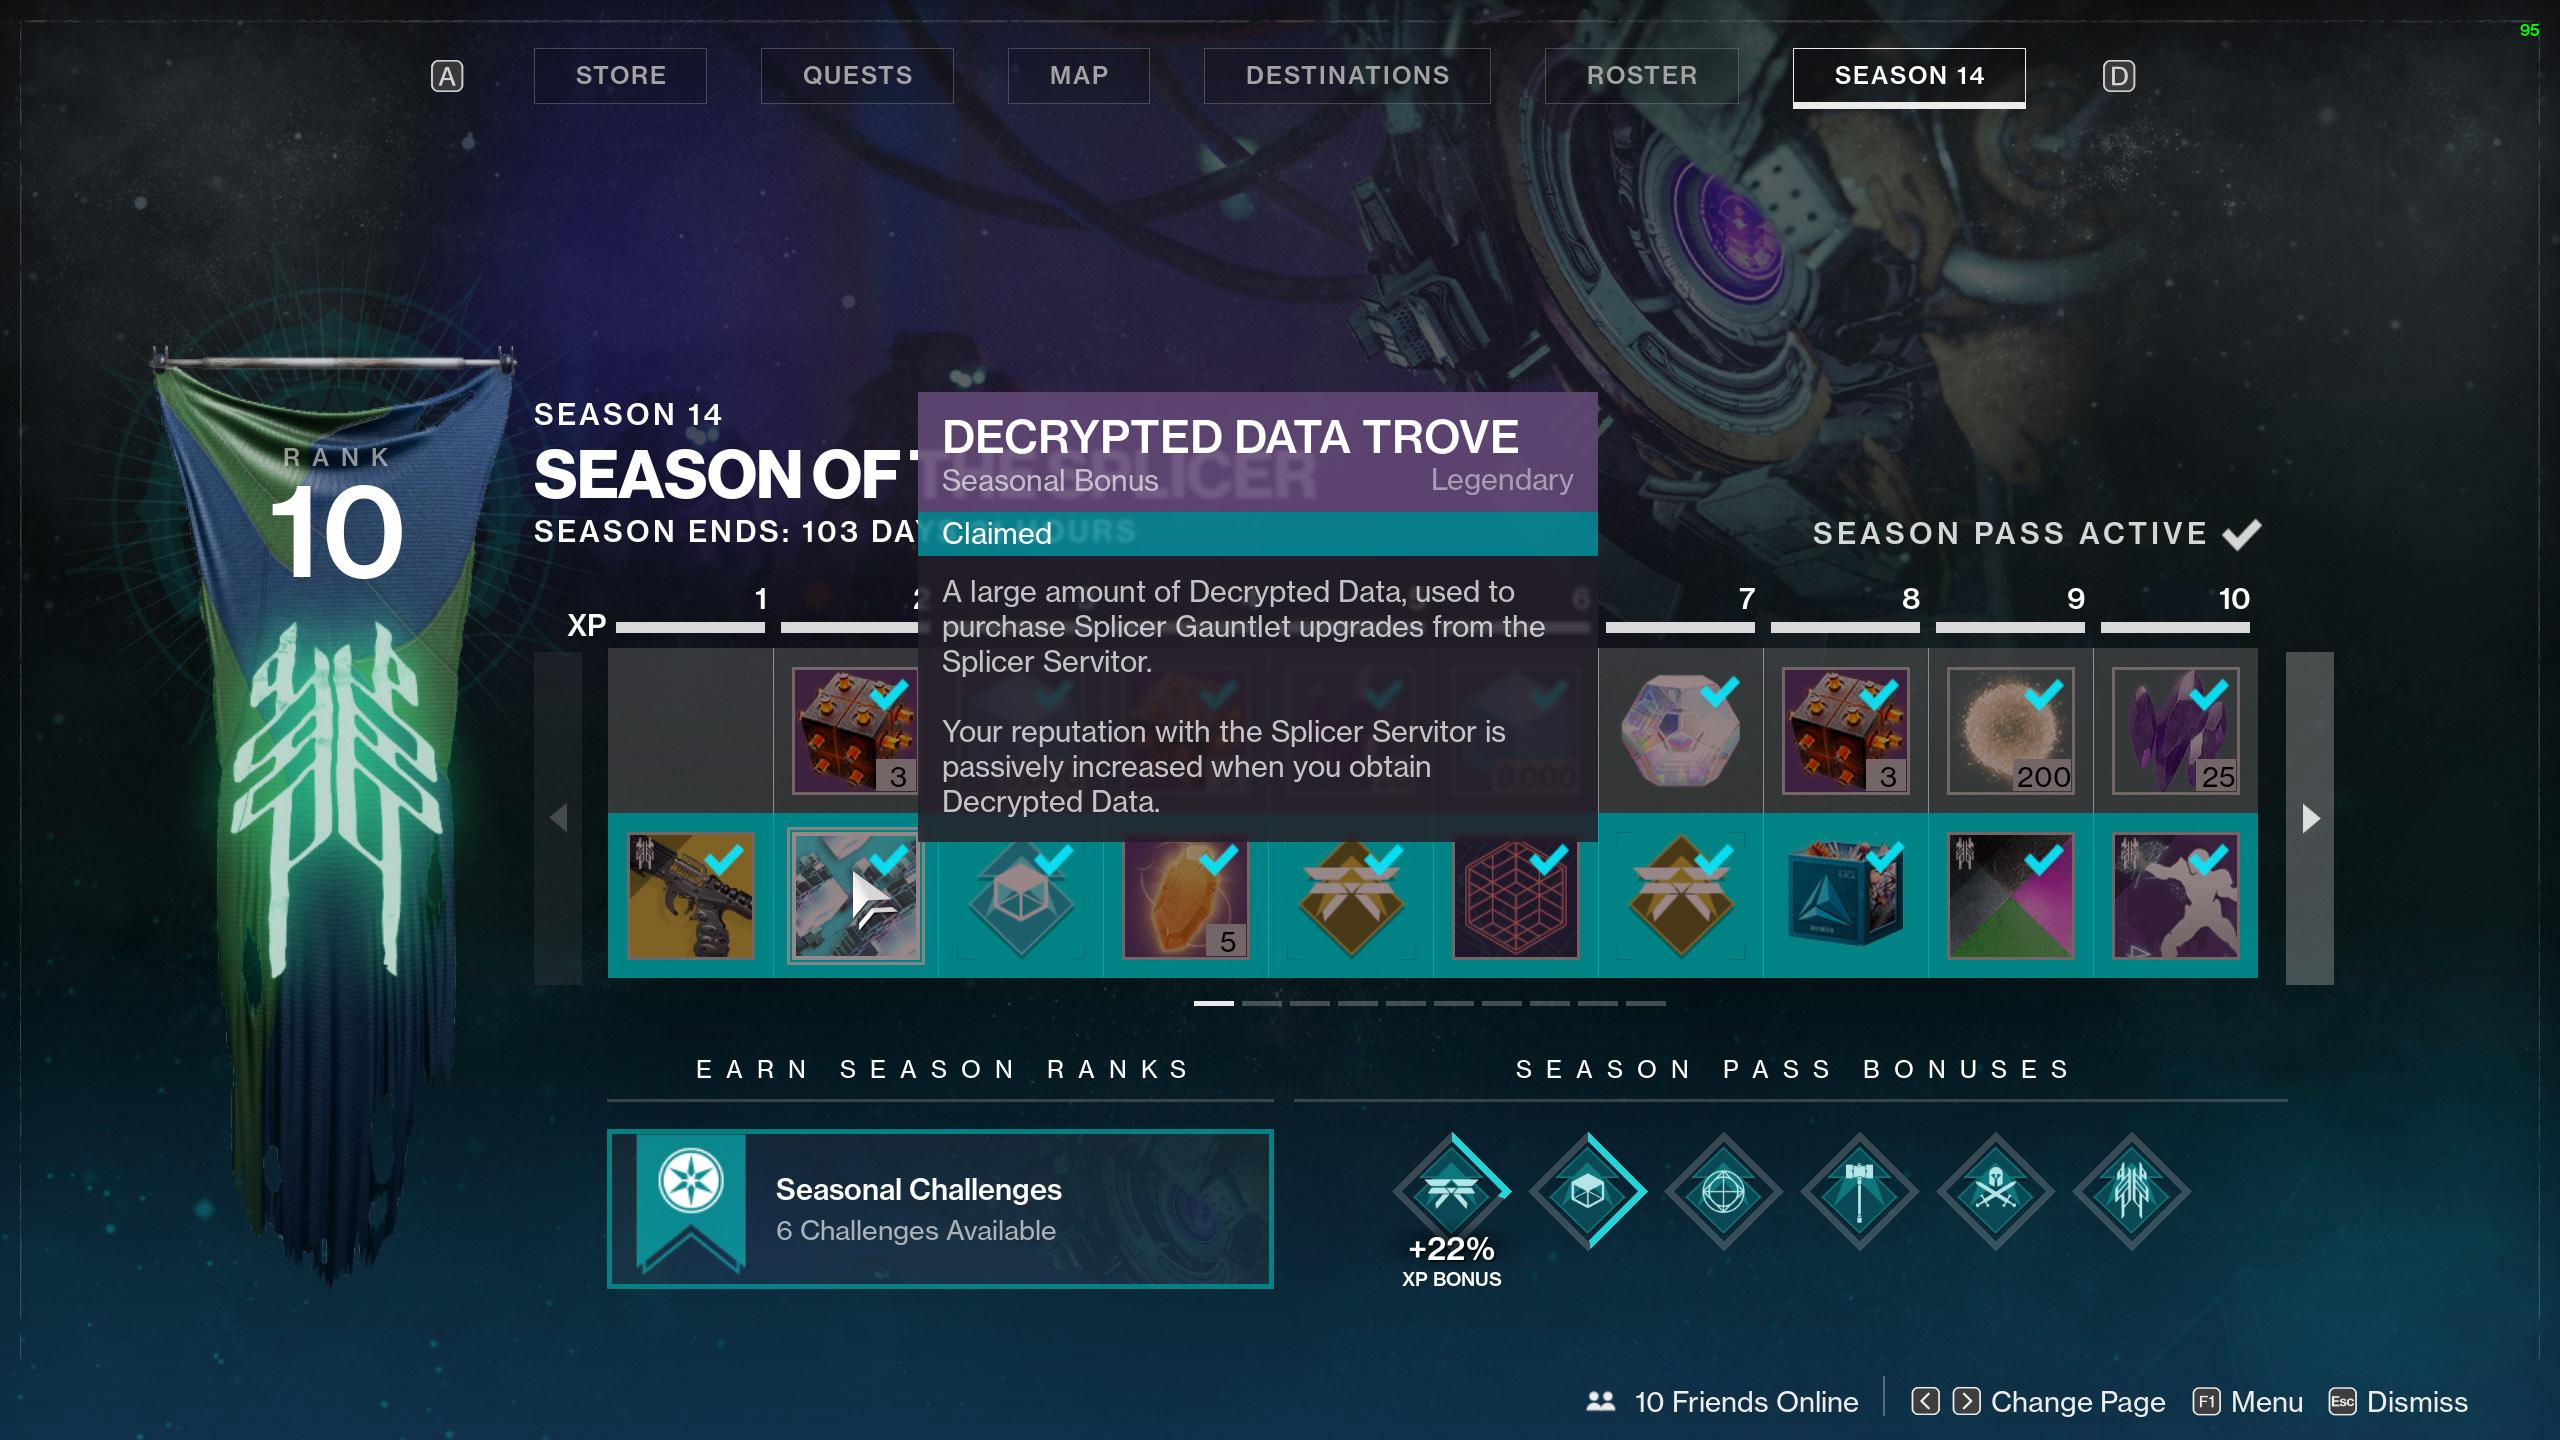 destiny 2 decrypted data season pass